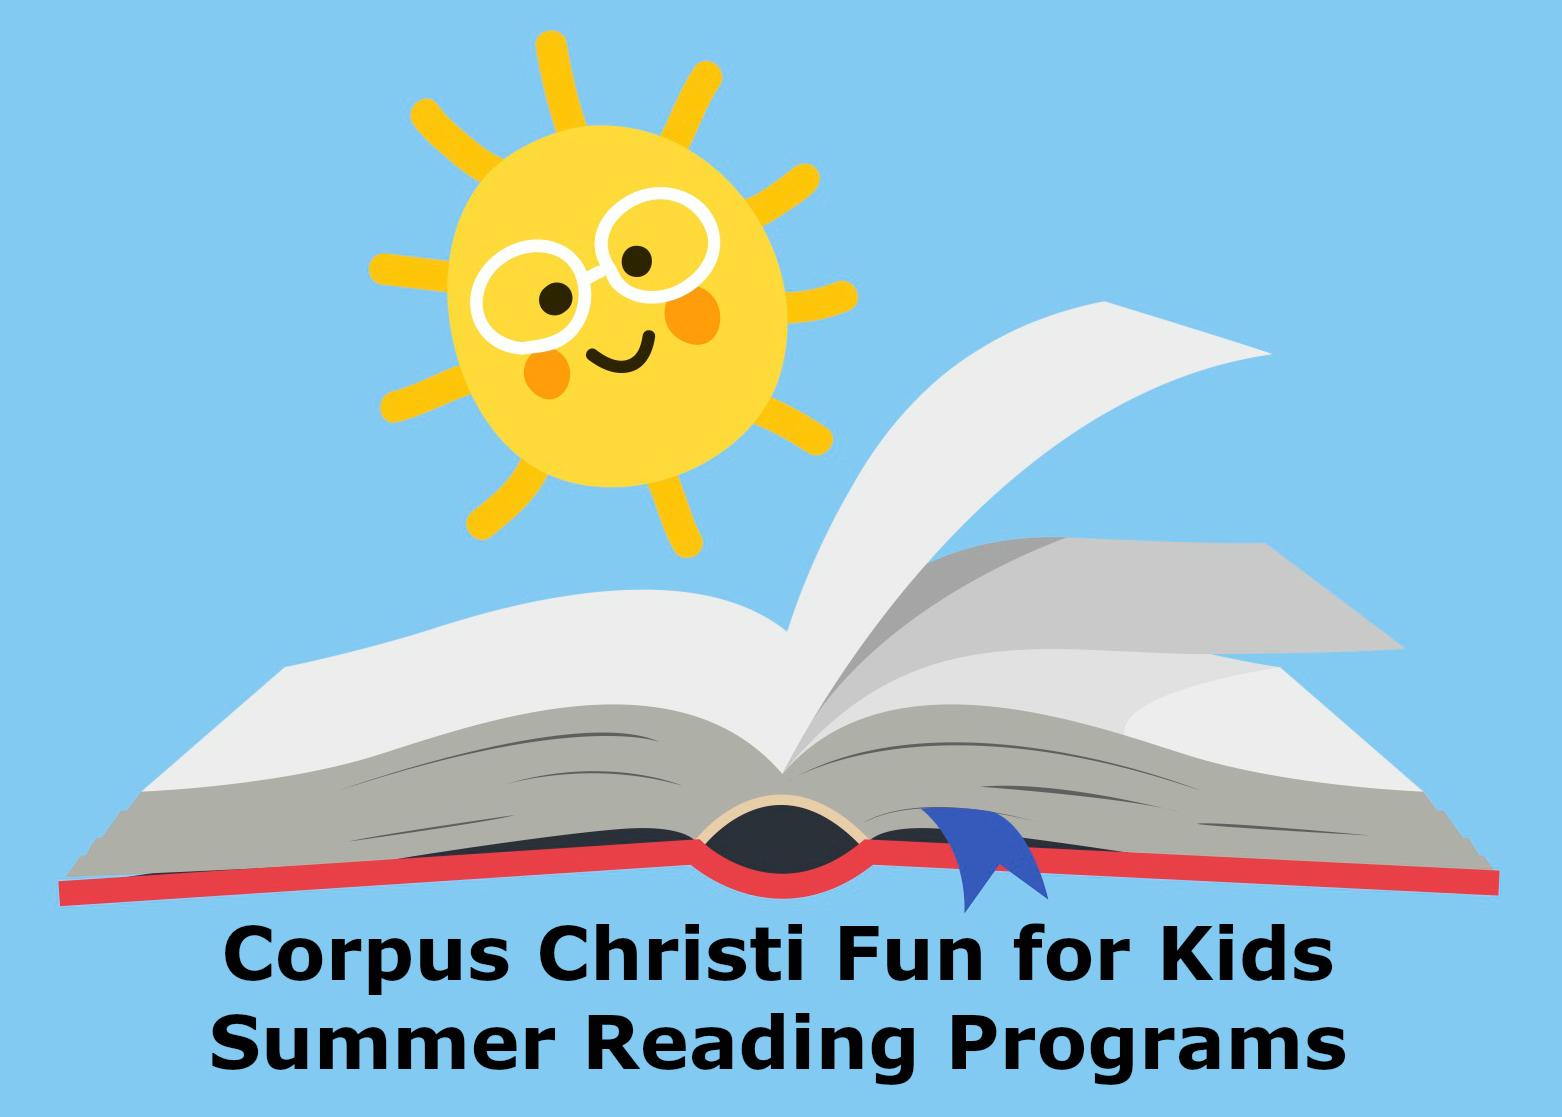 Summer Reading is Fun 2016   Corpus Christi Fun for Kids